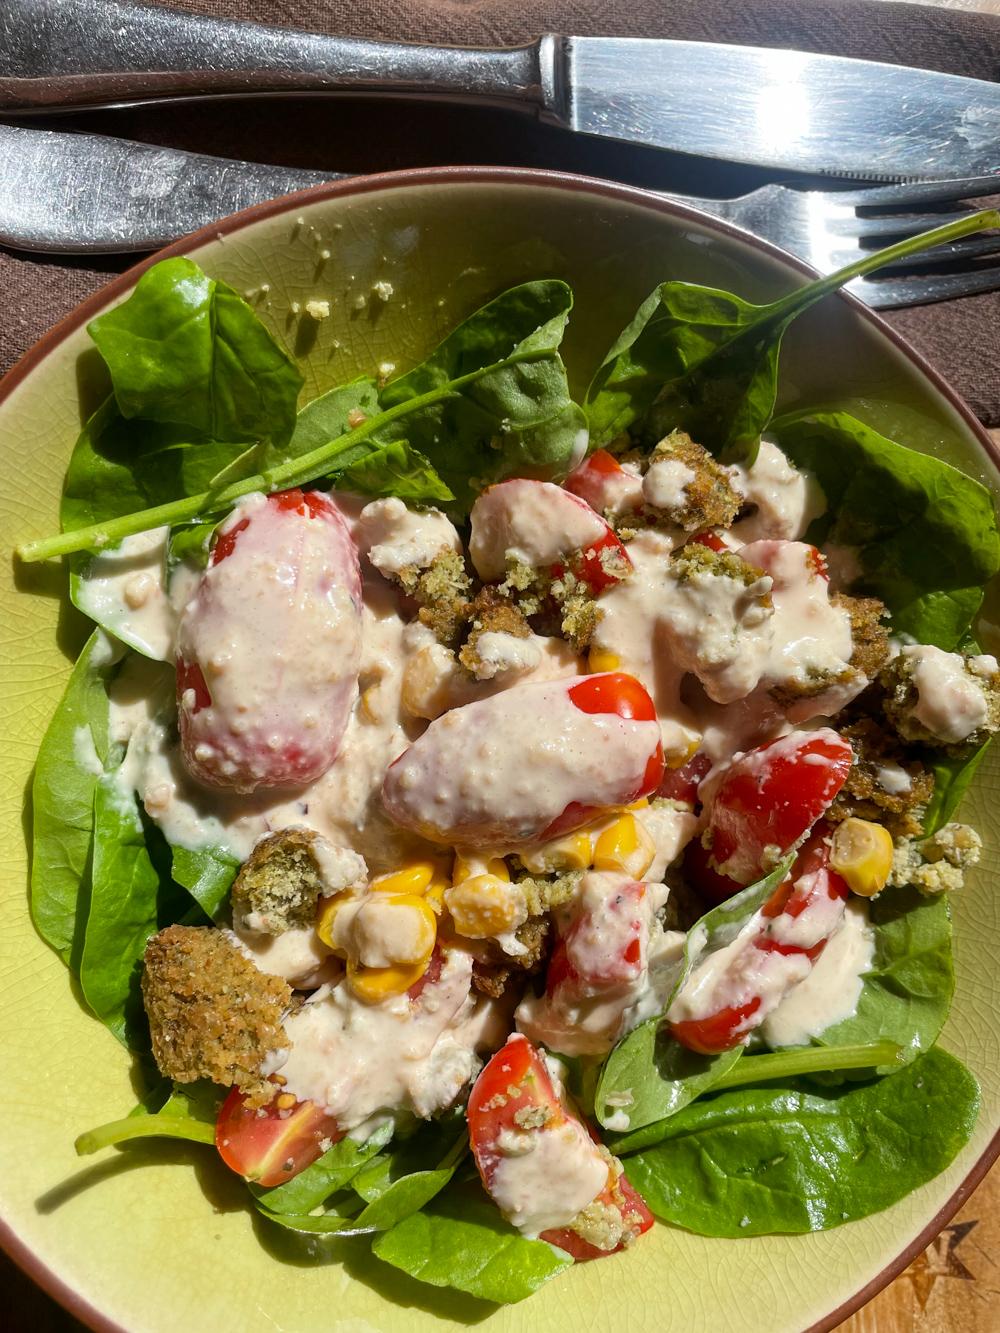 Quick salad with yummy peanut dressing